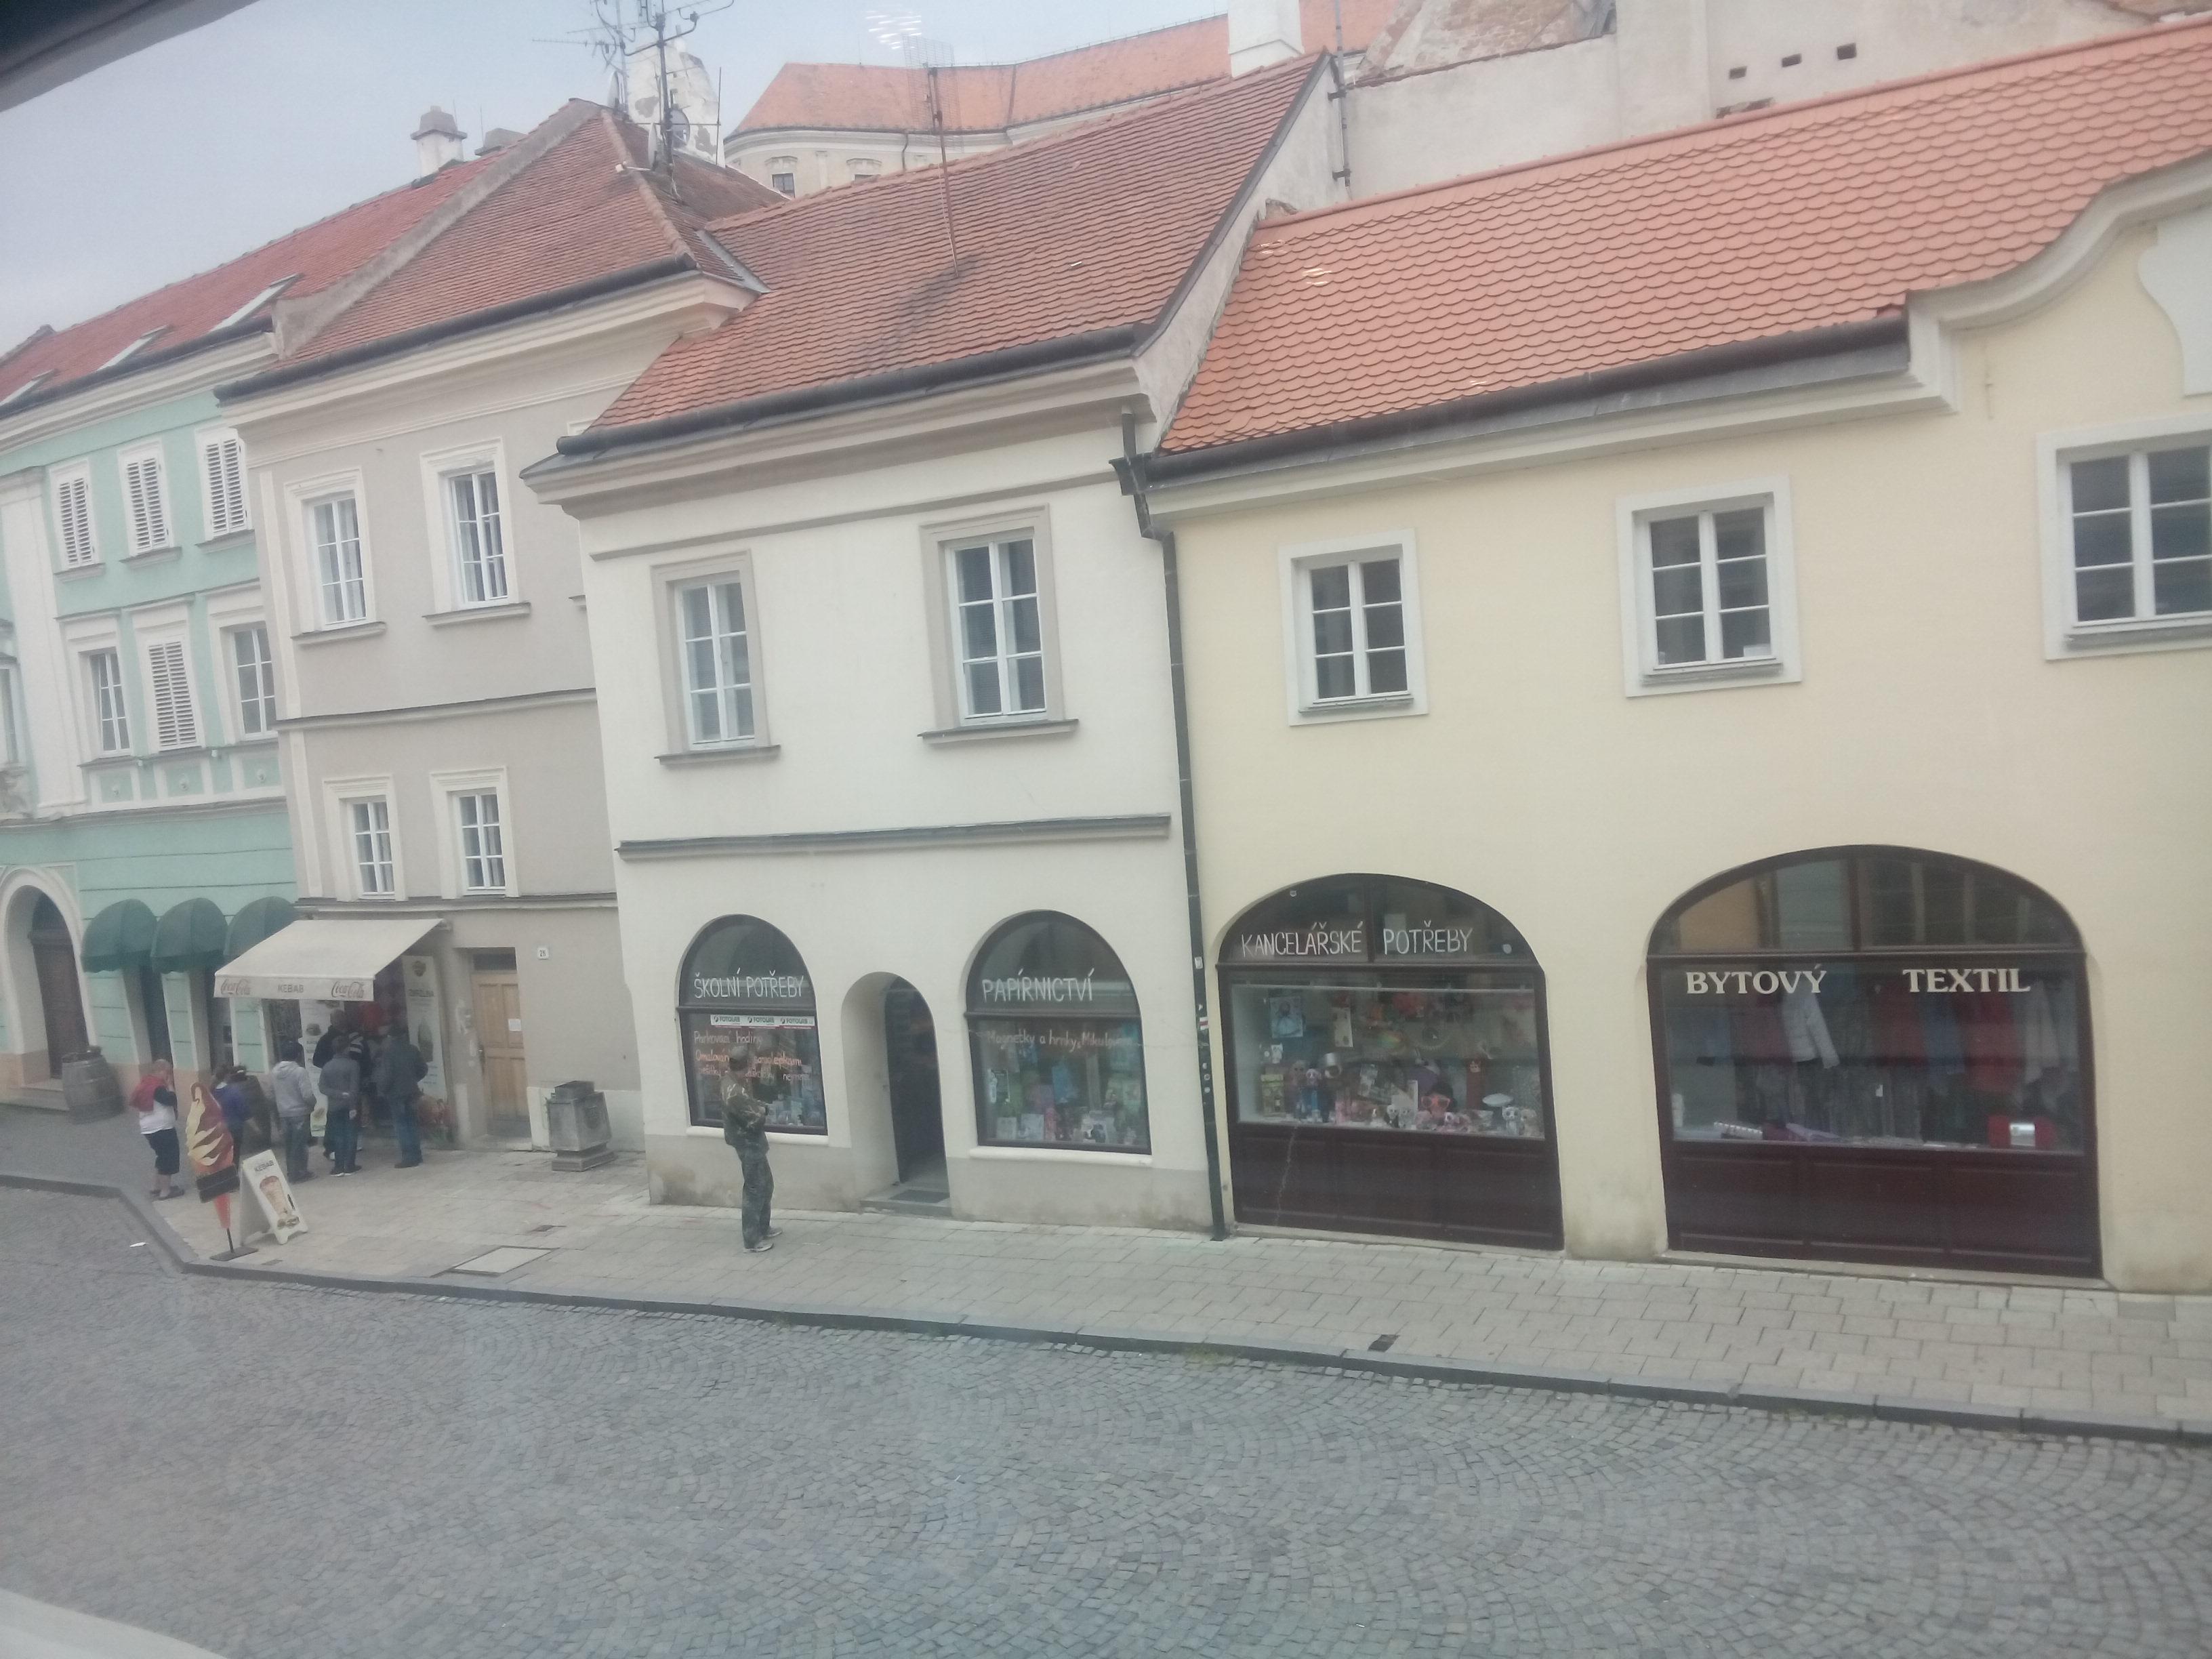 https://i.amy.gy/201804-slovakia-austria-czech/IMG_20180416_170741.jpg